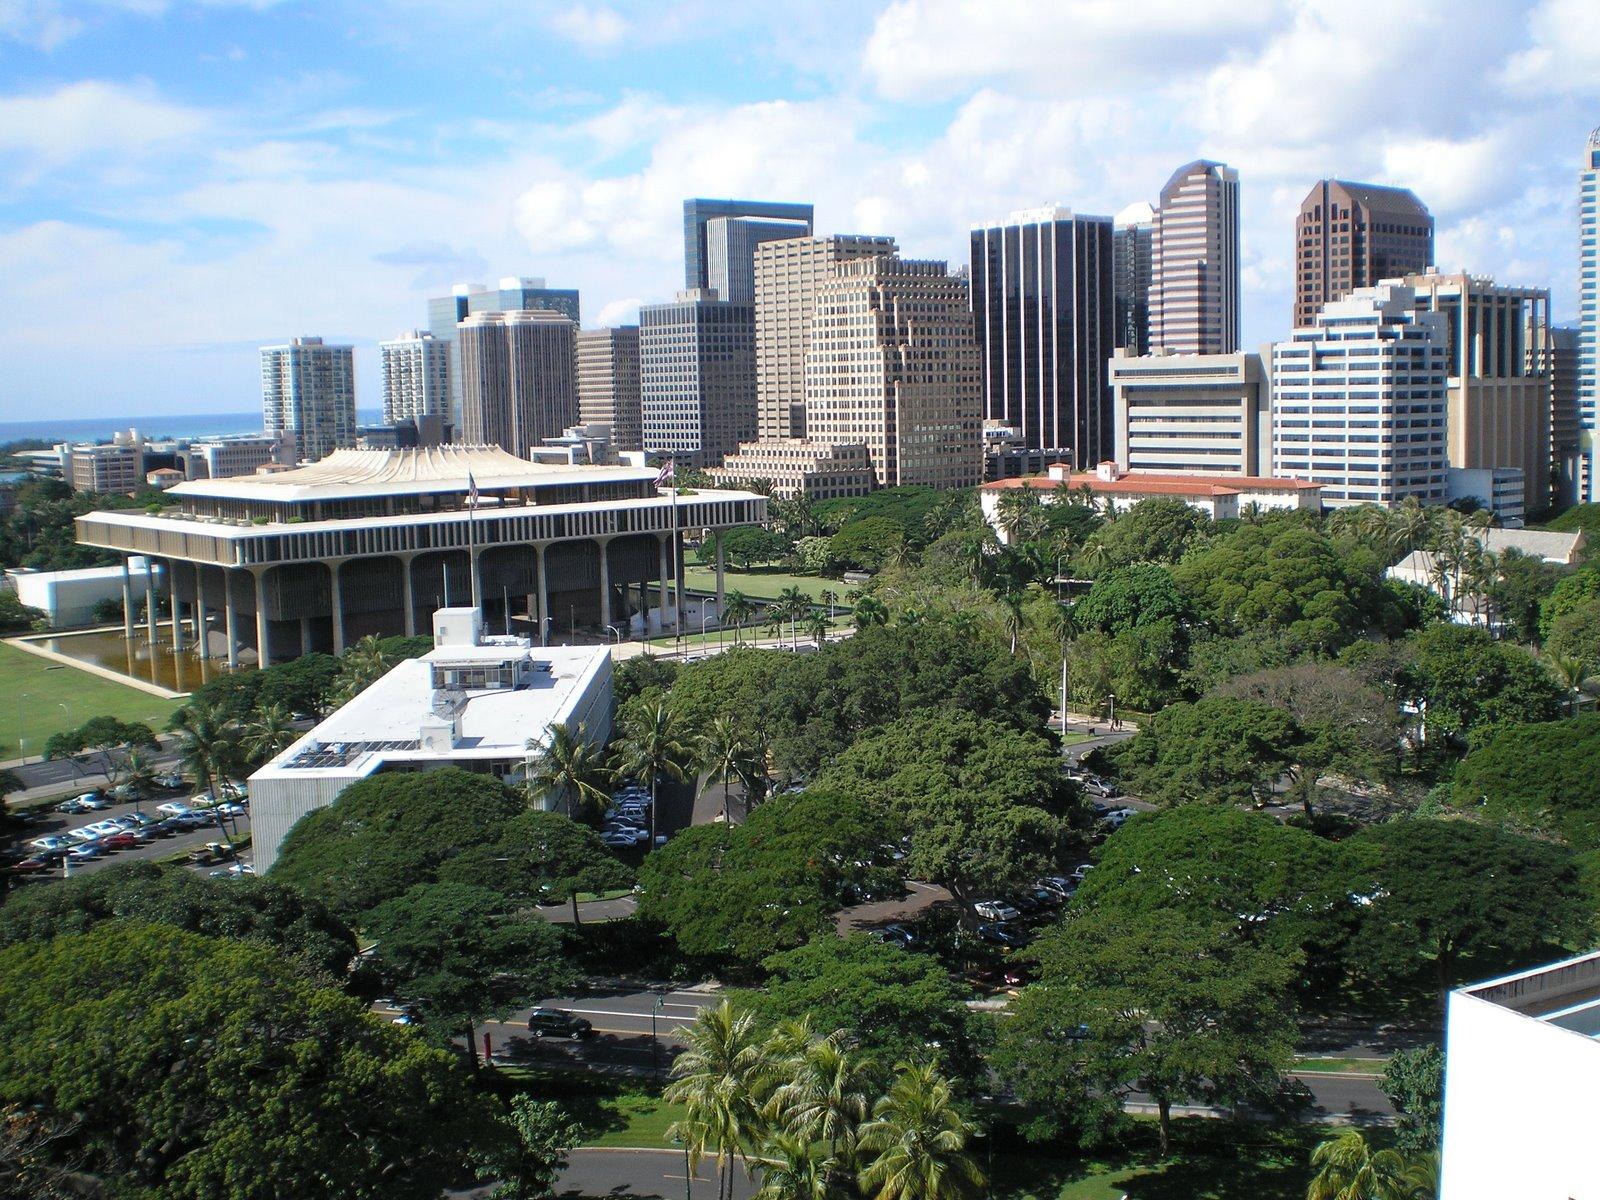 Oahu Kauai Filming Locations For Alexander Payne S The